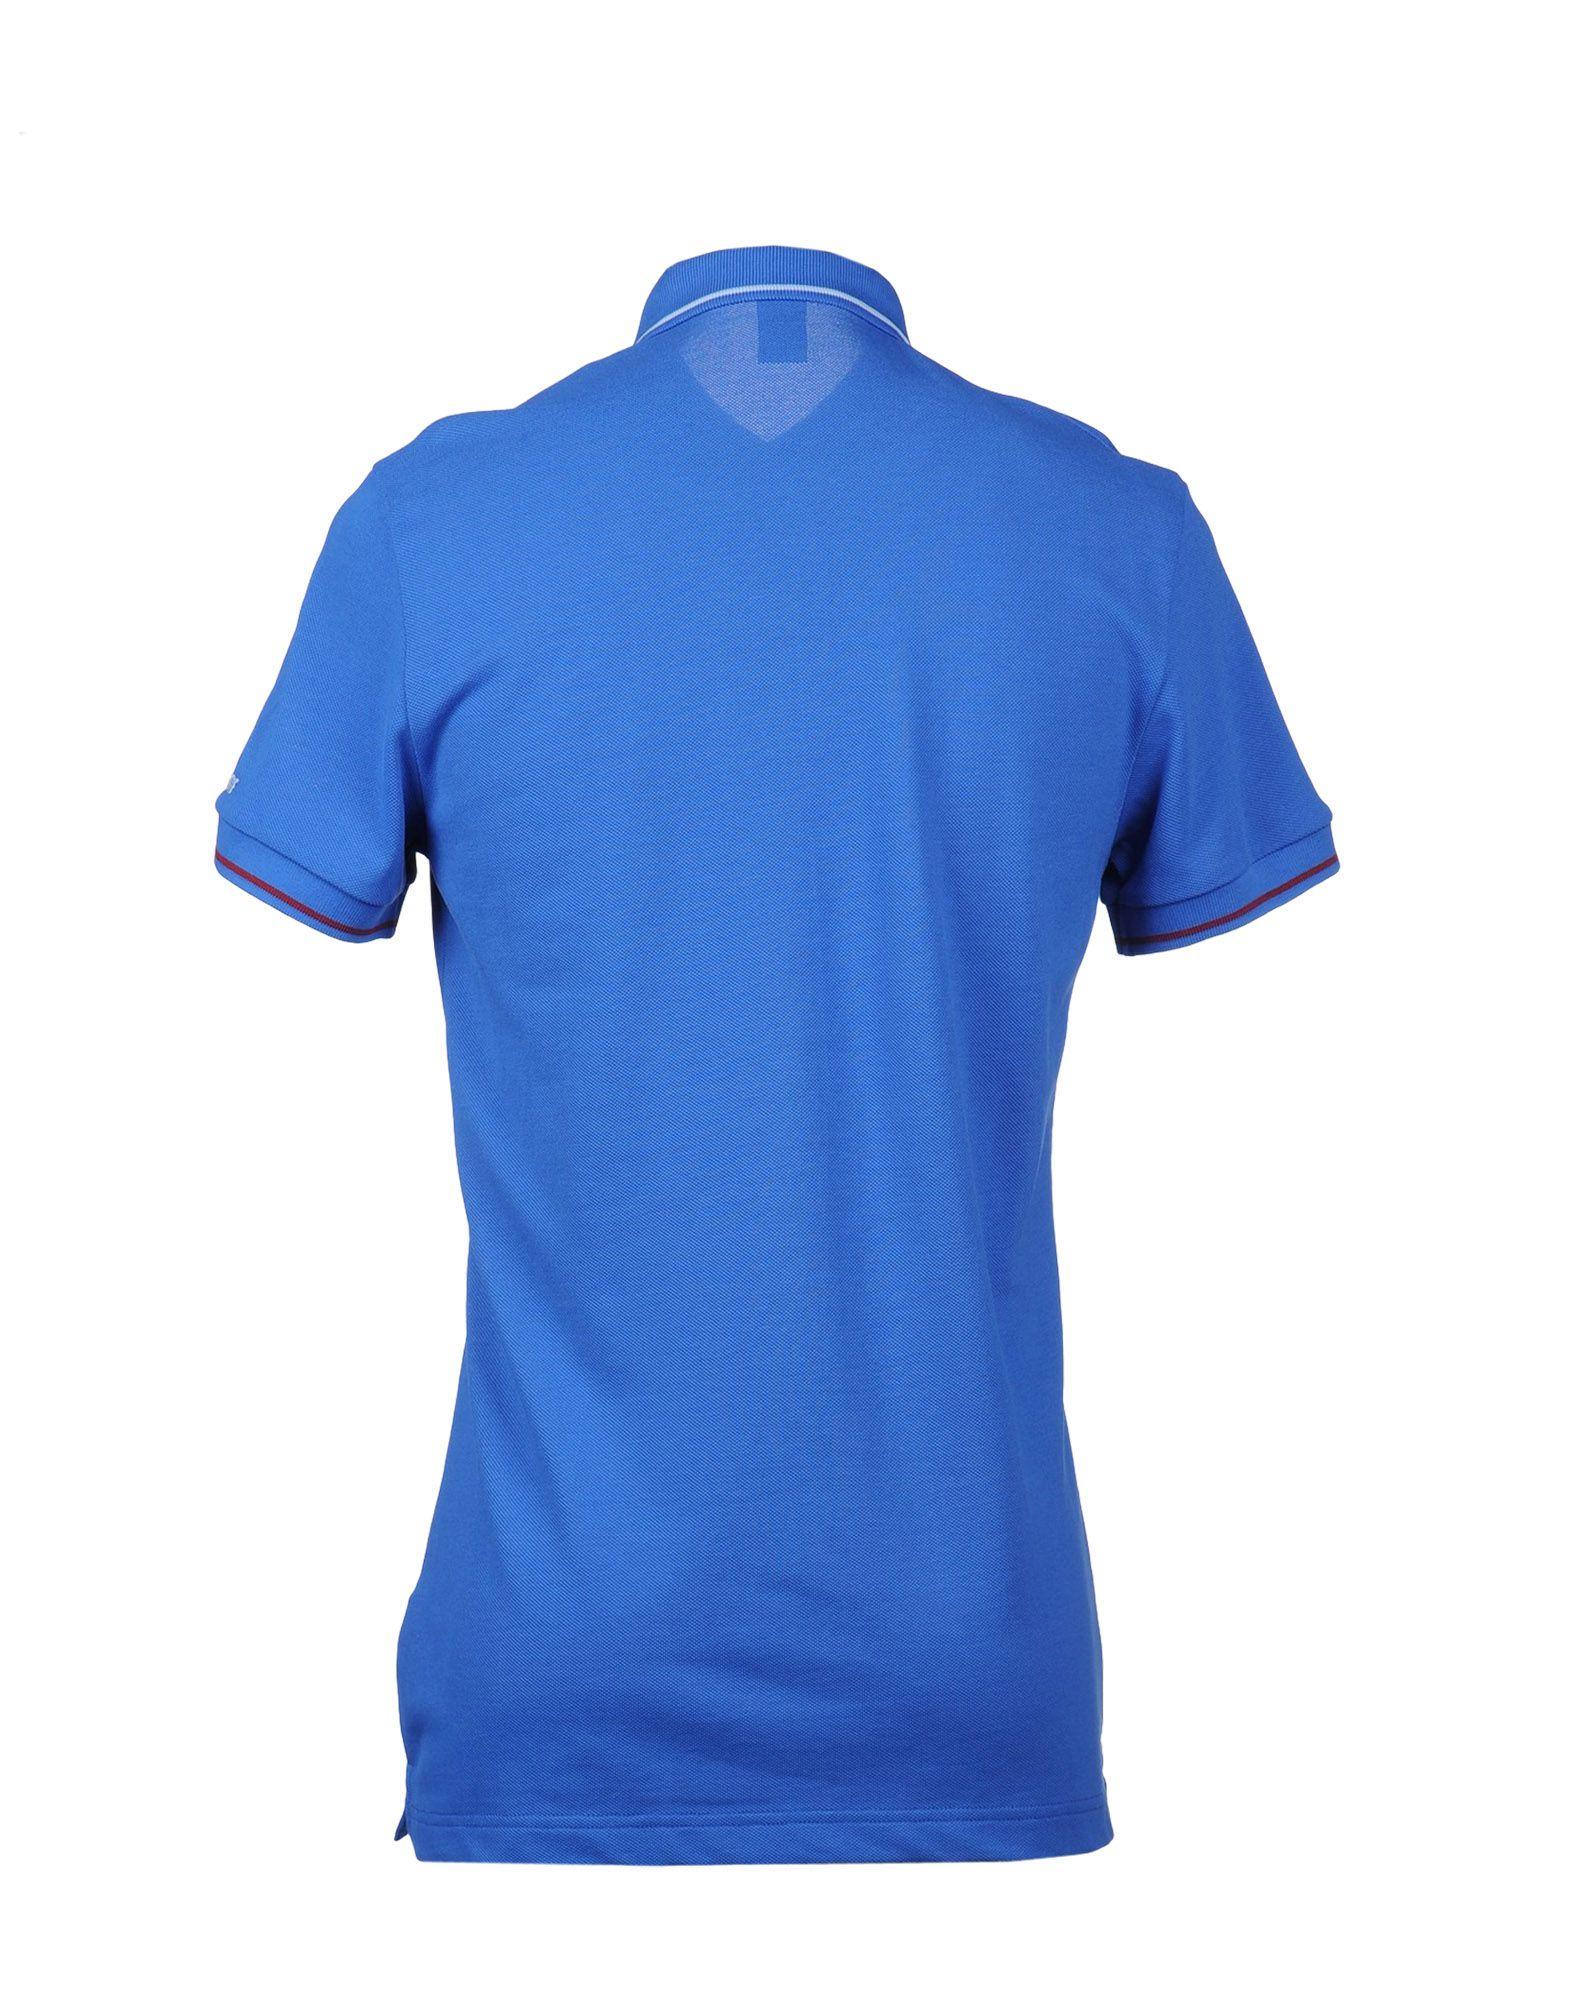 le coq sportif shirt - photo #32